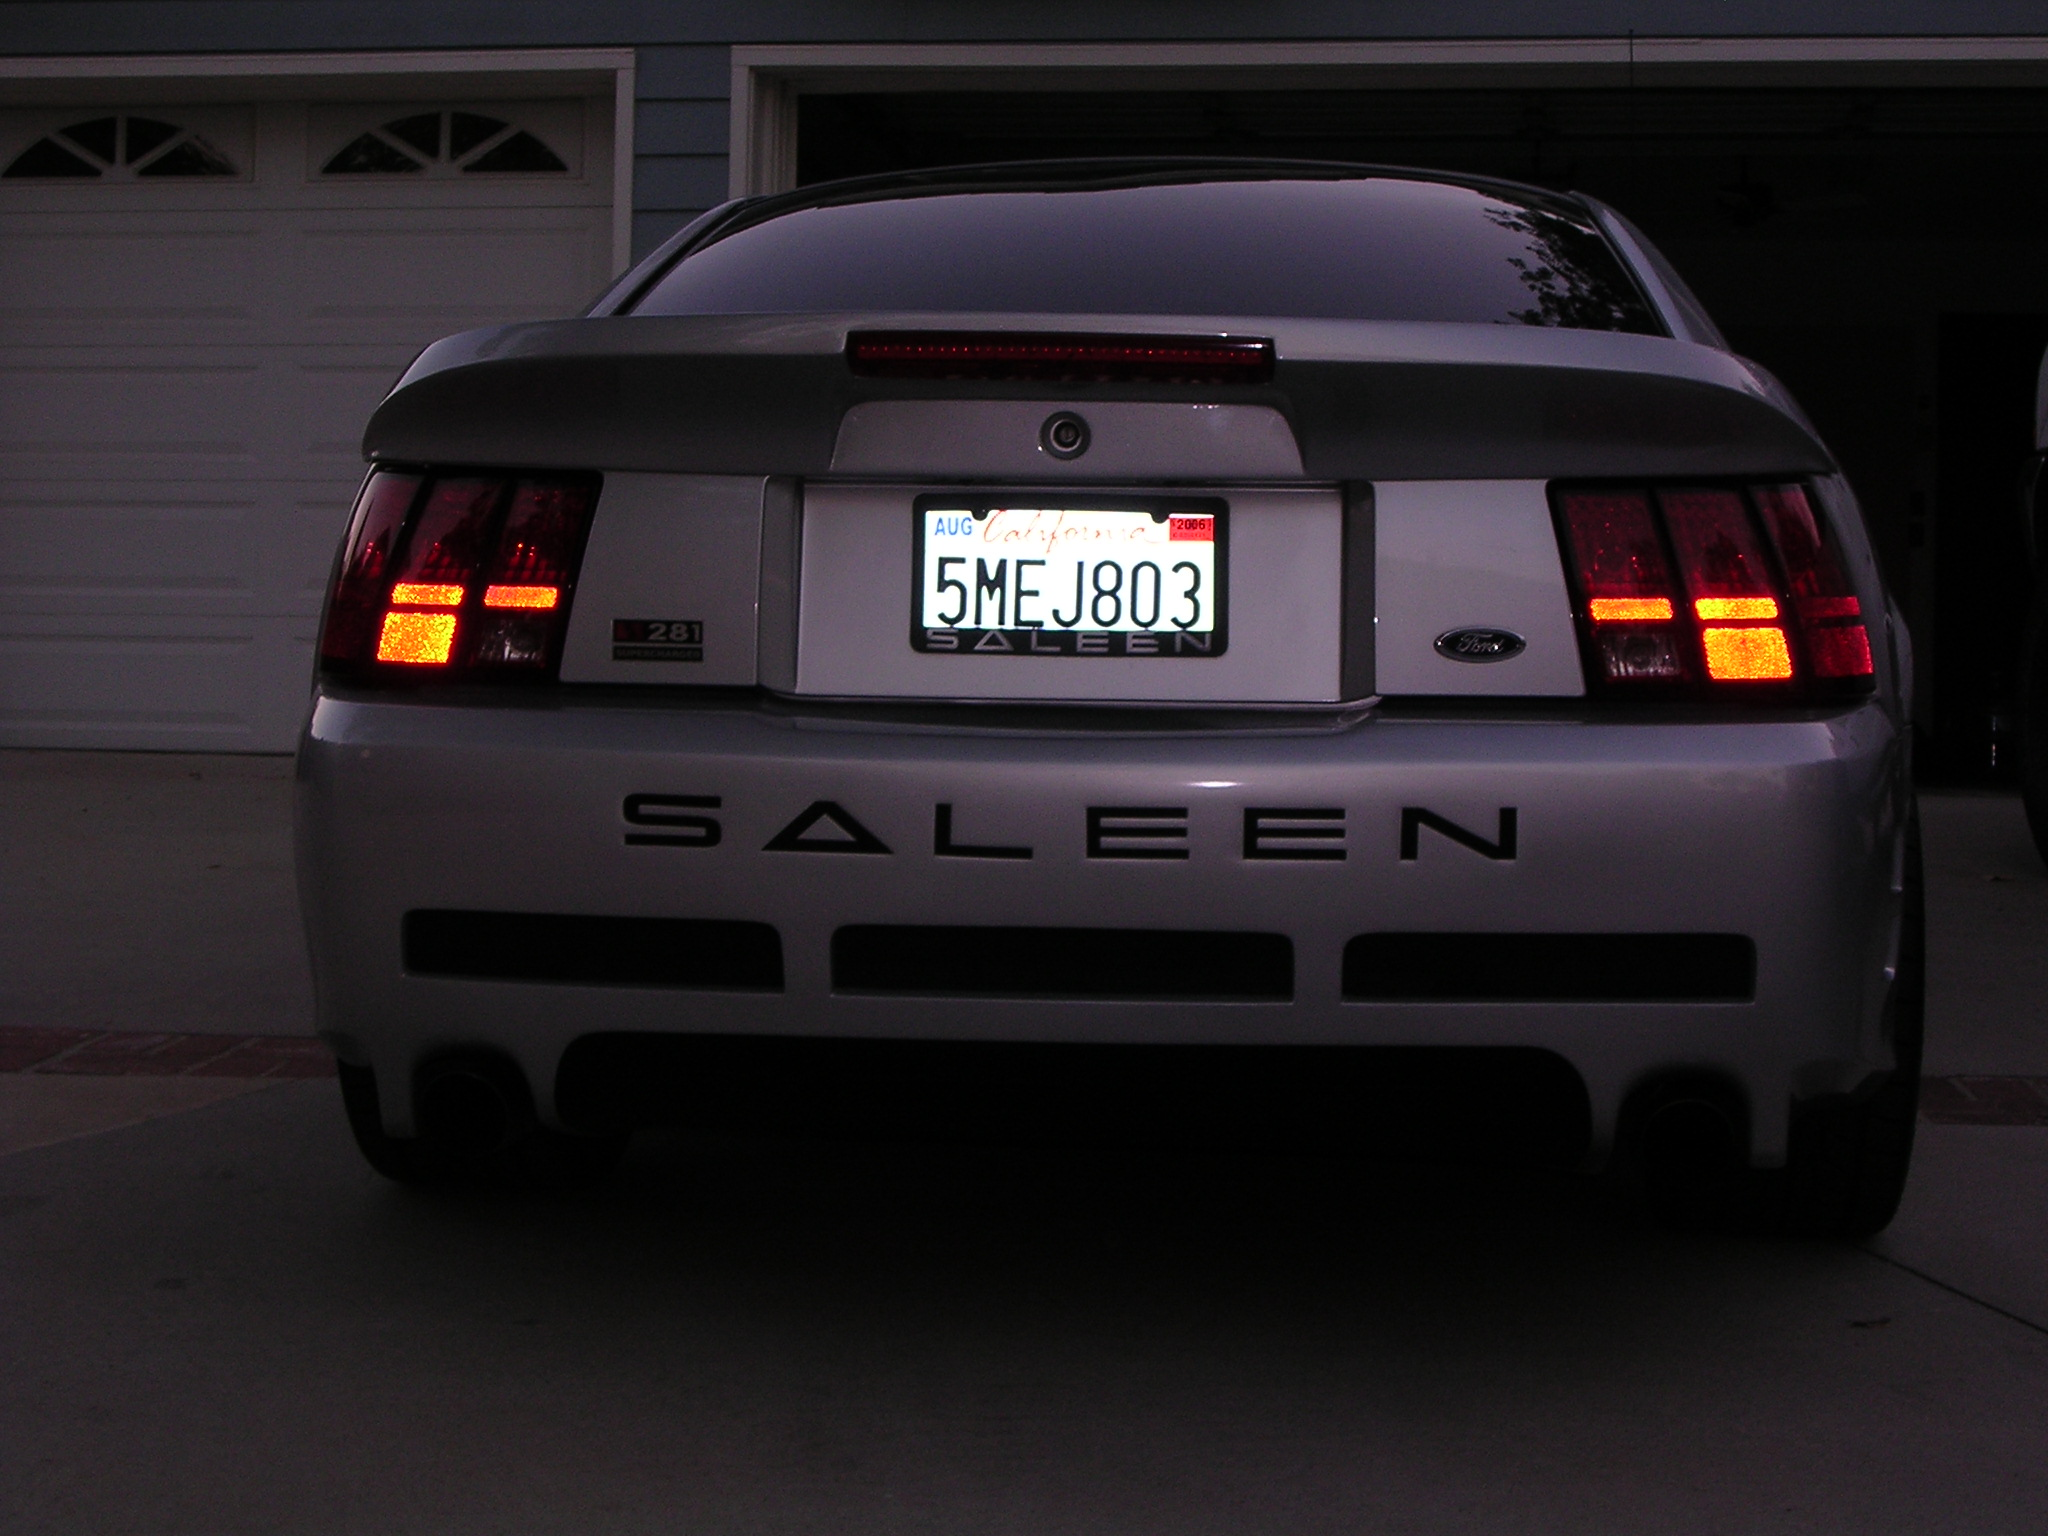 Click image for larger version  Name:saleen%20back%202.JPG Views:109 Size:596.5 KB ID:10502